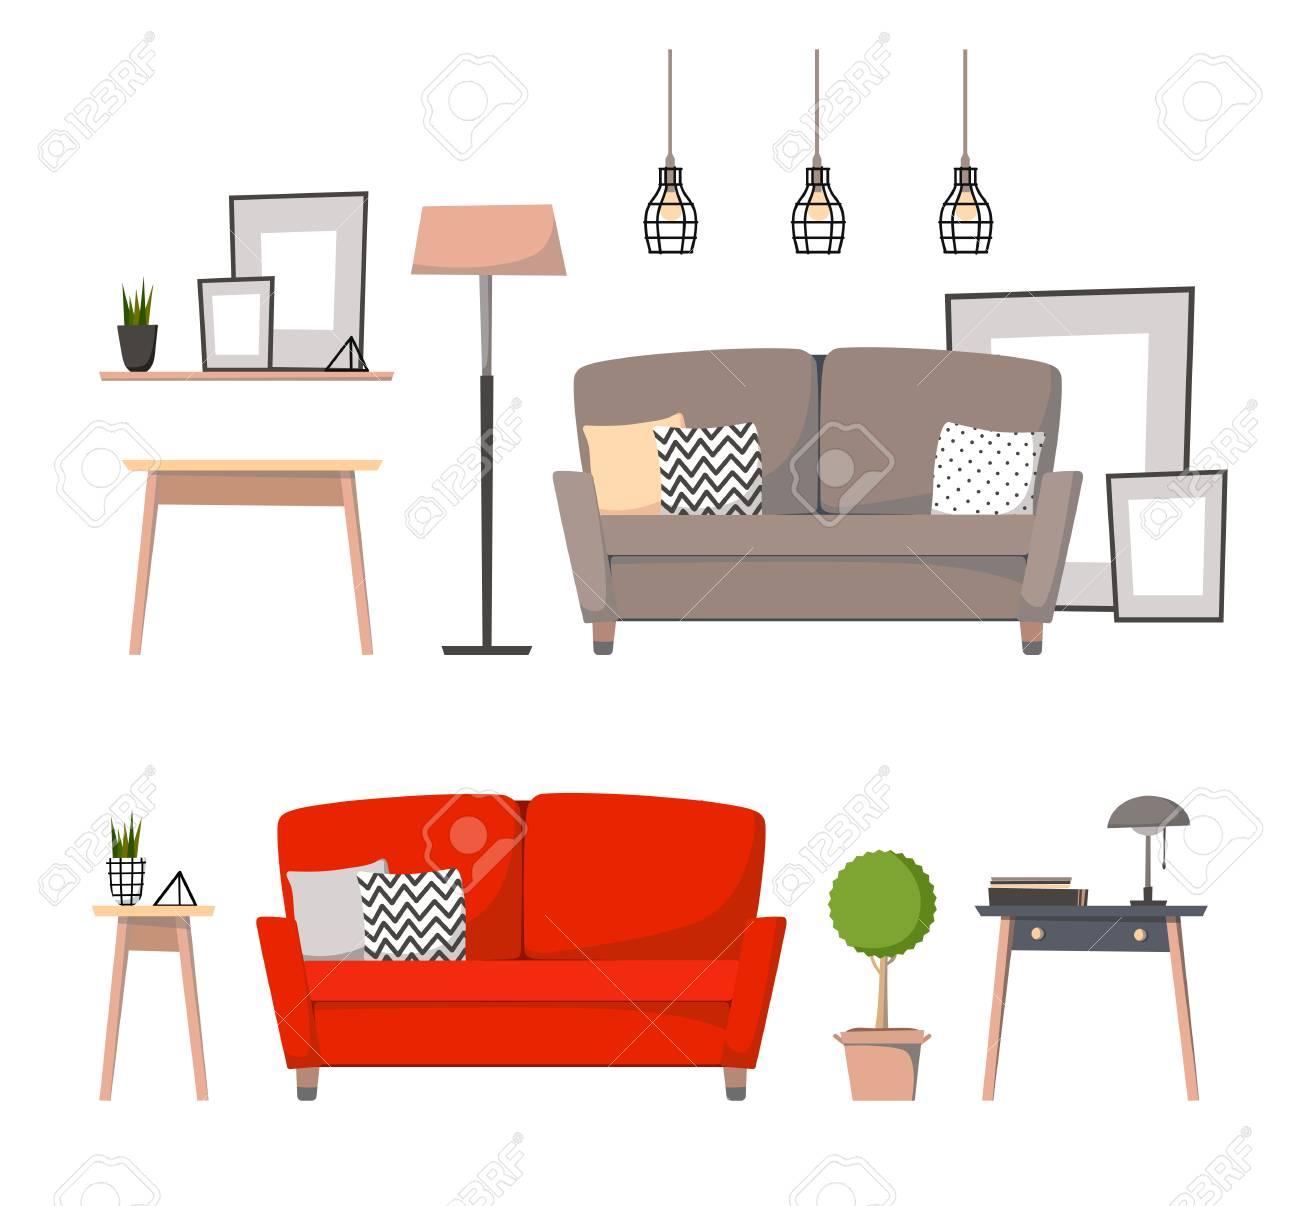 Flat Illustrations   Design Elements Of Home Interior (sofa, Curbstone,  Floor Lamp,